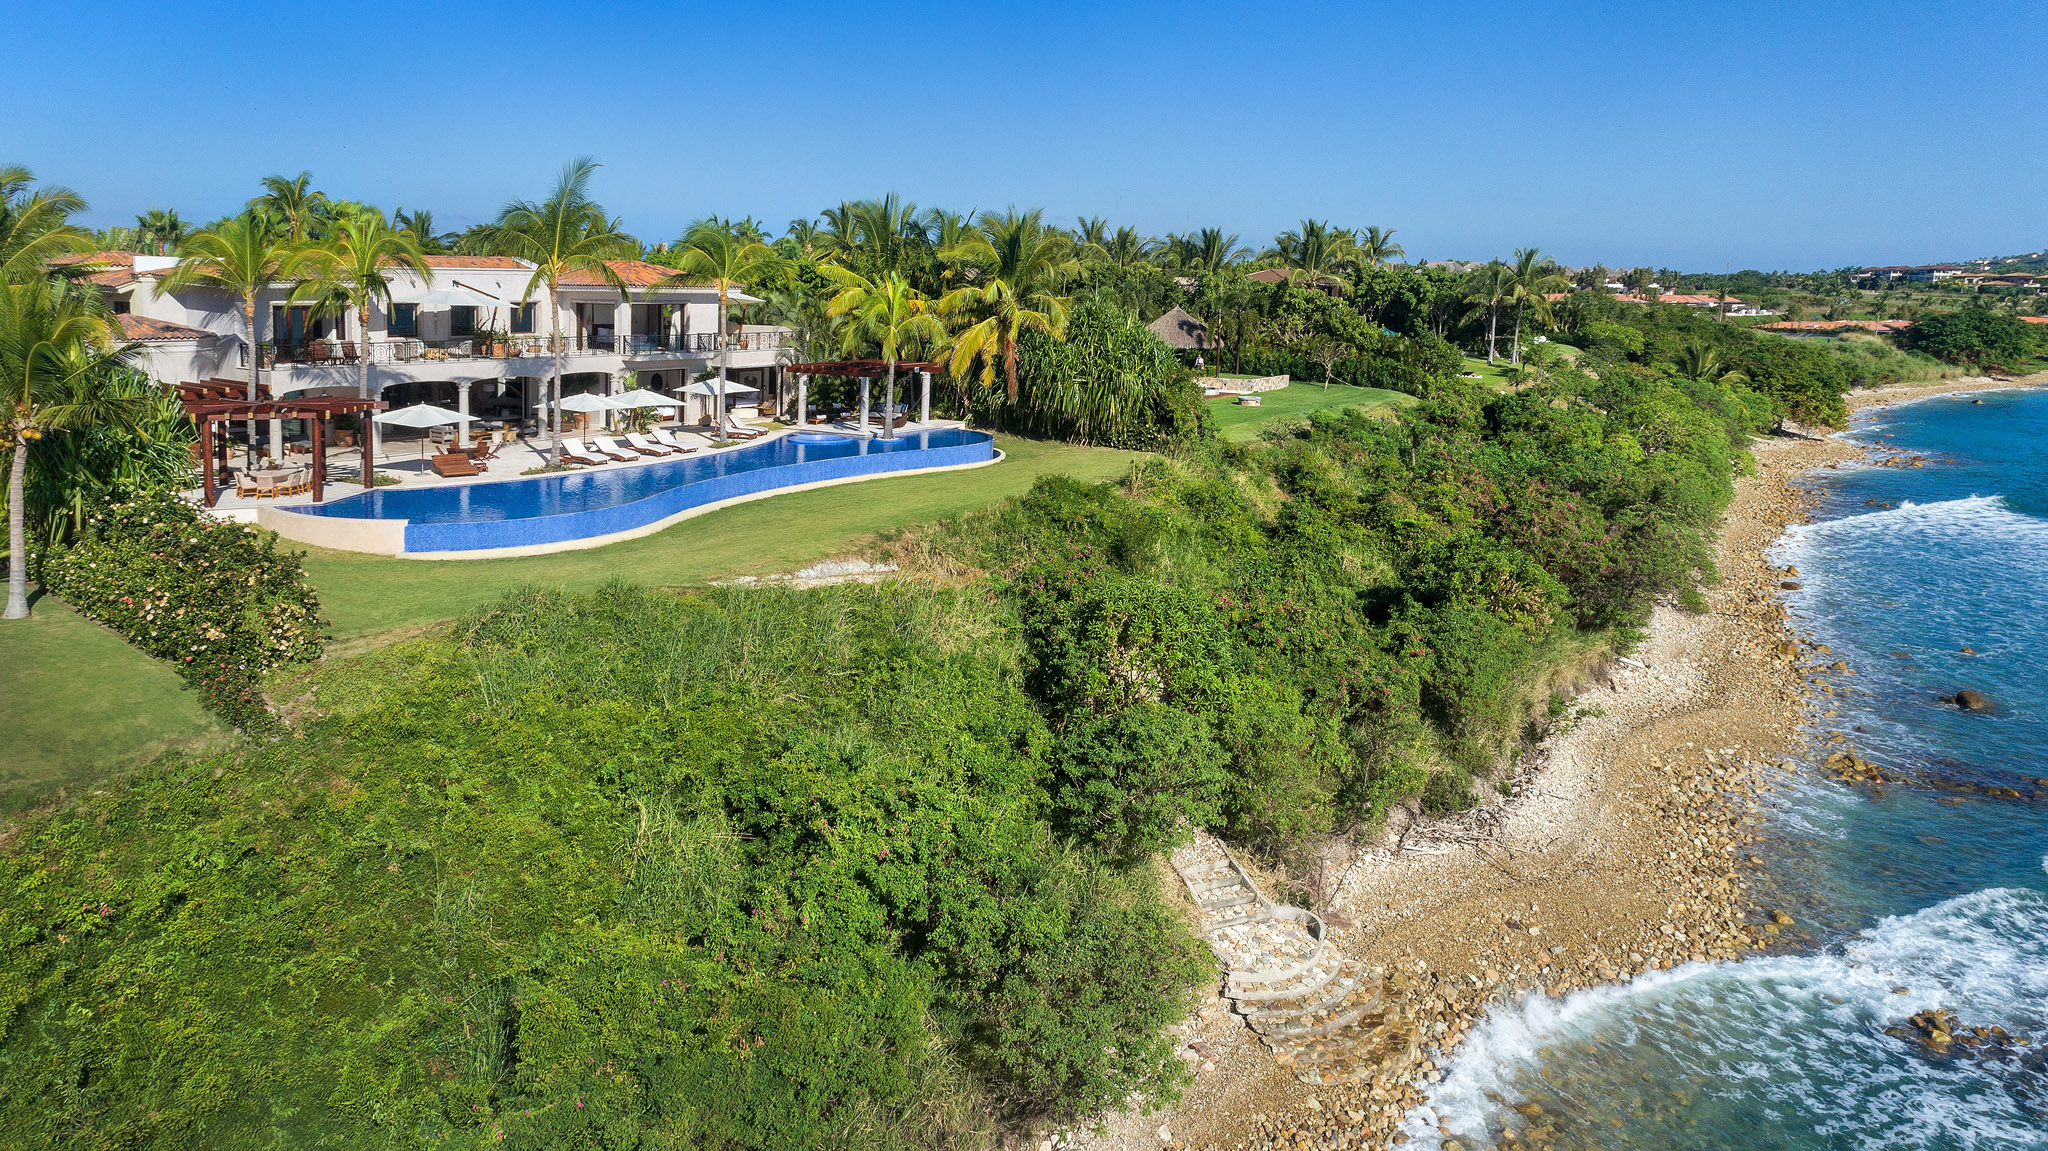 Casa la VIda_aerial 2.jpg